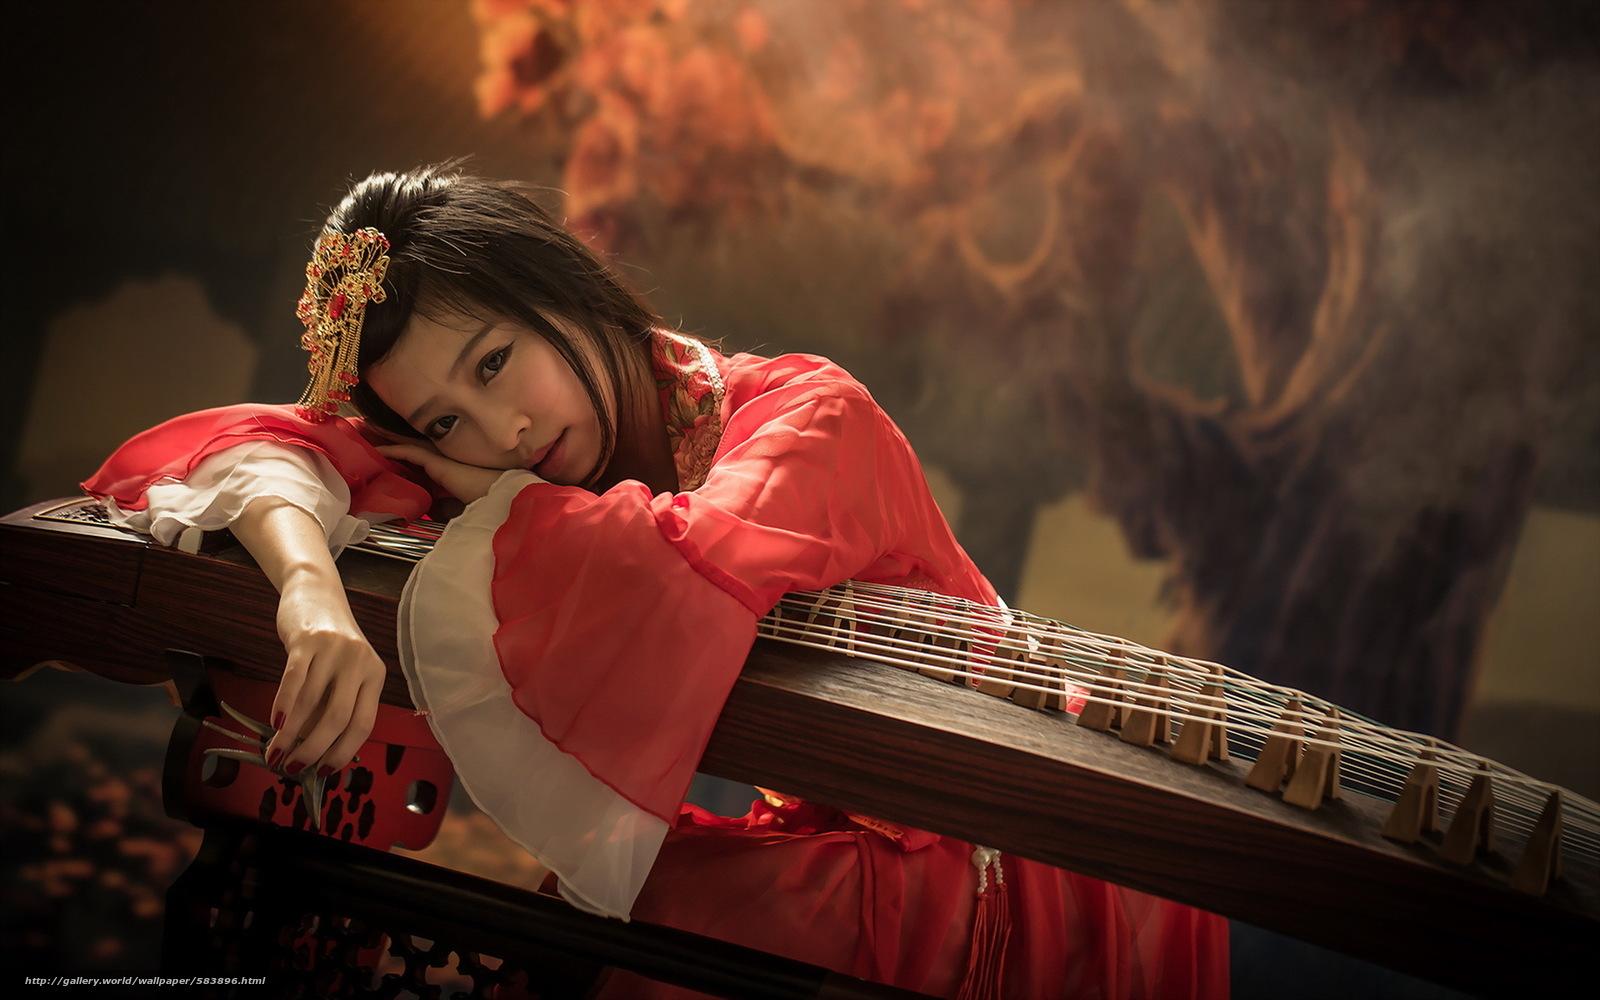 девушка, инструмент, взгляд, азиатка, музыка